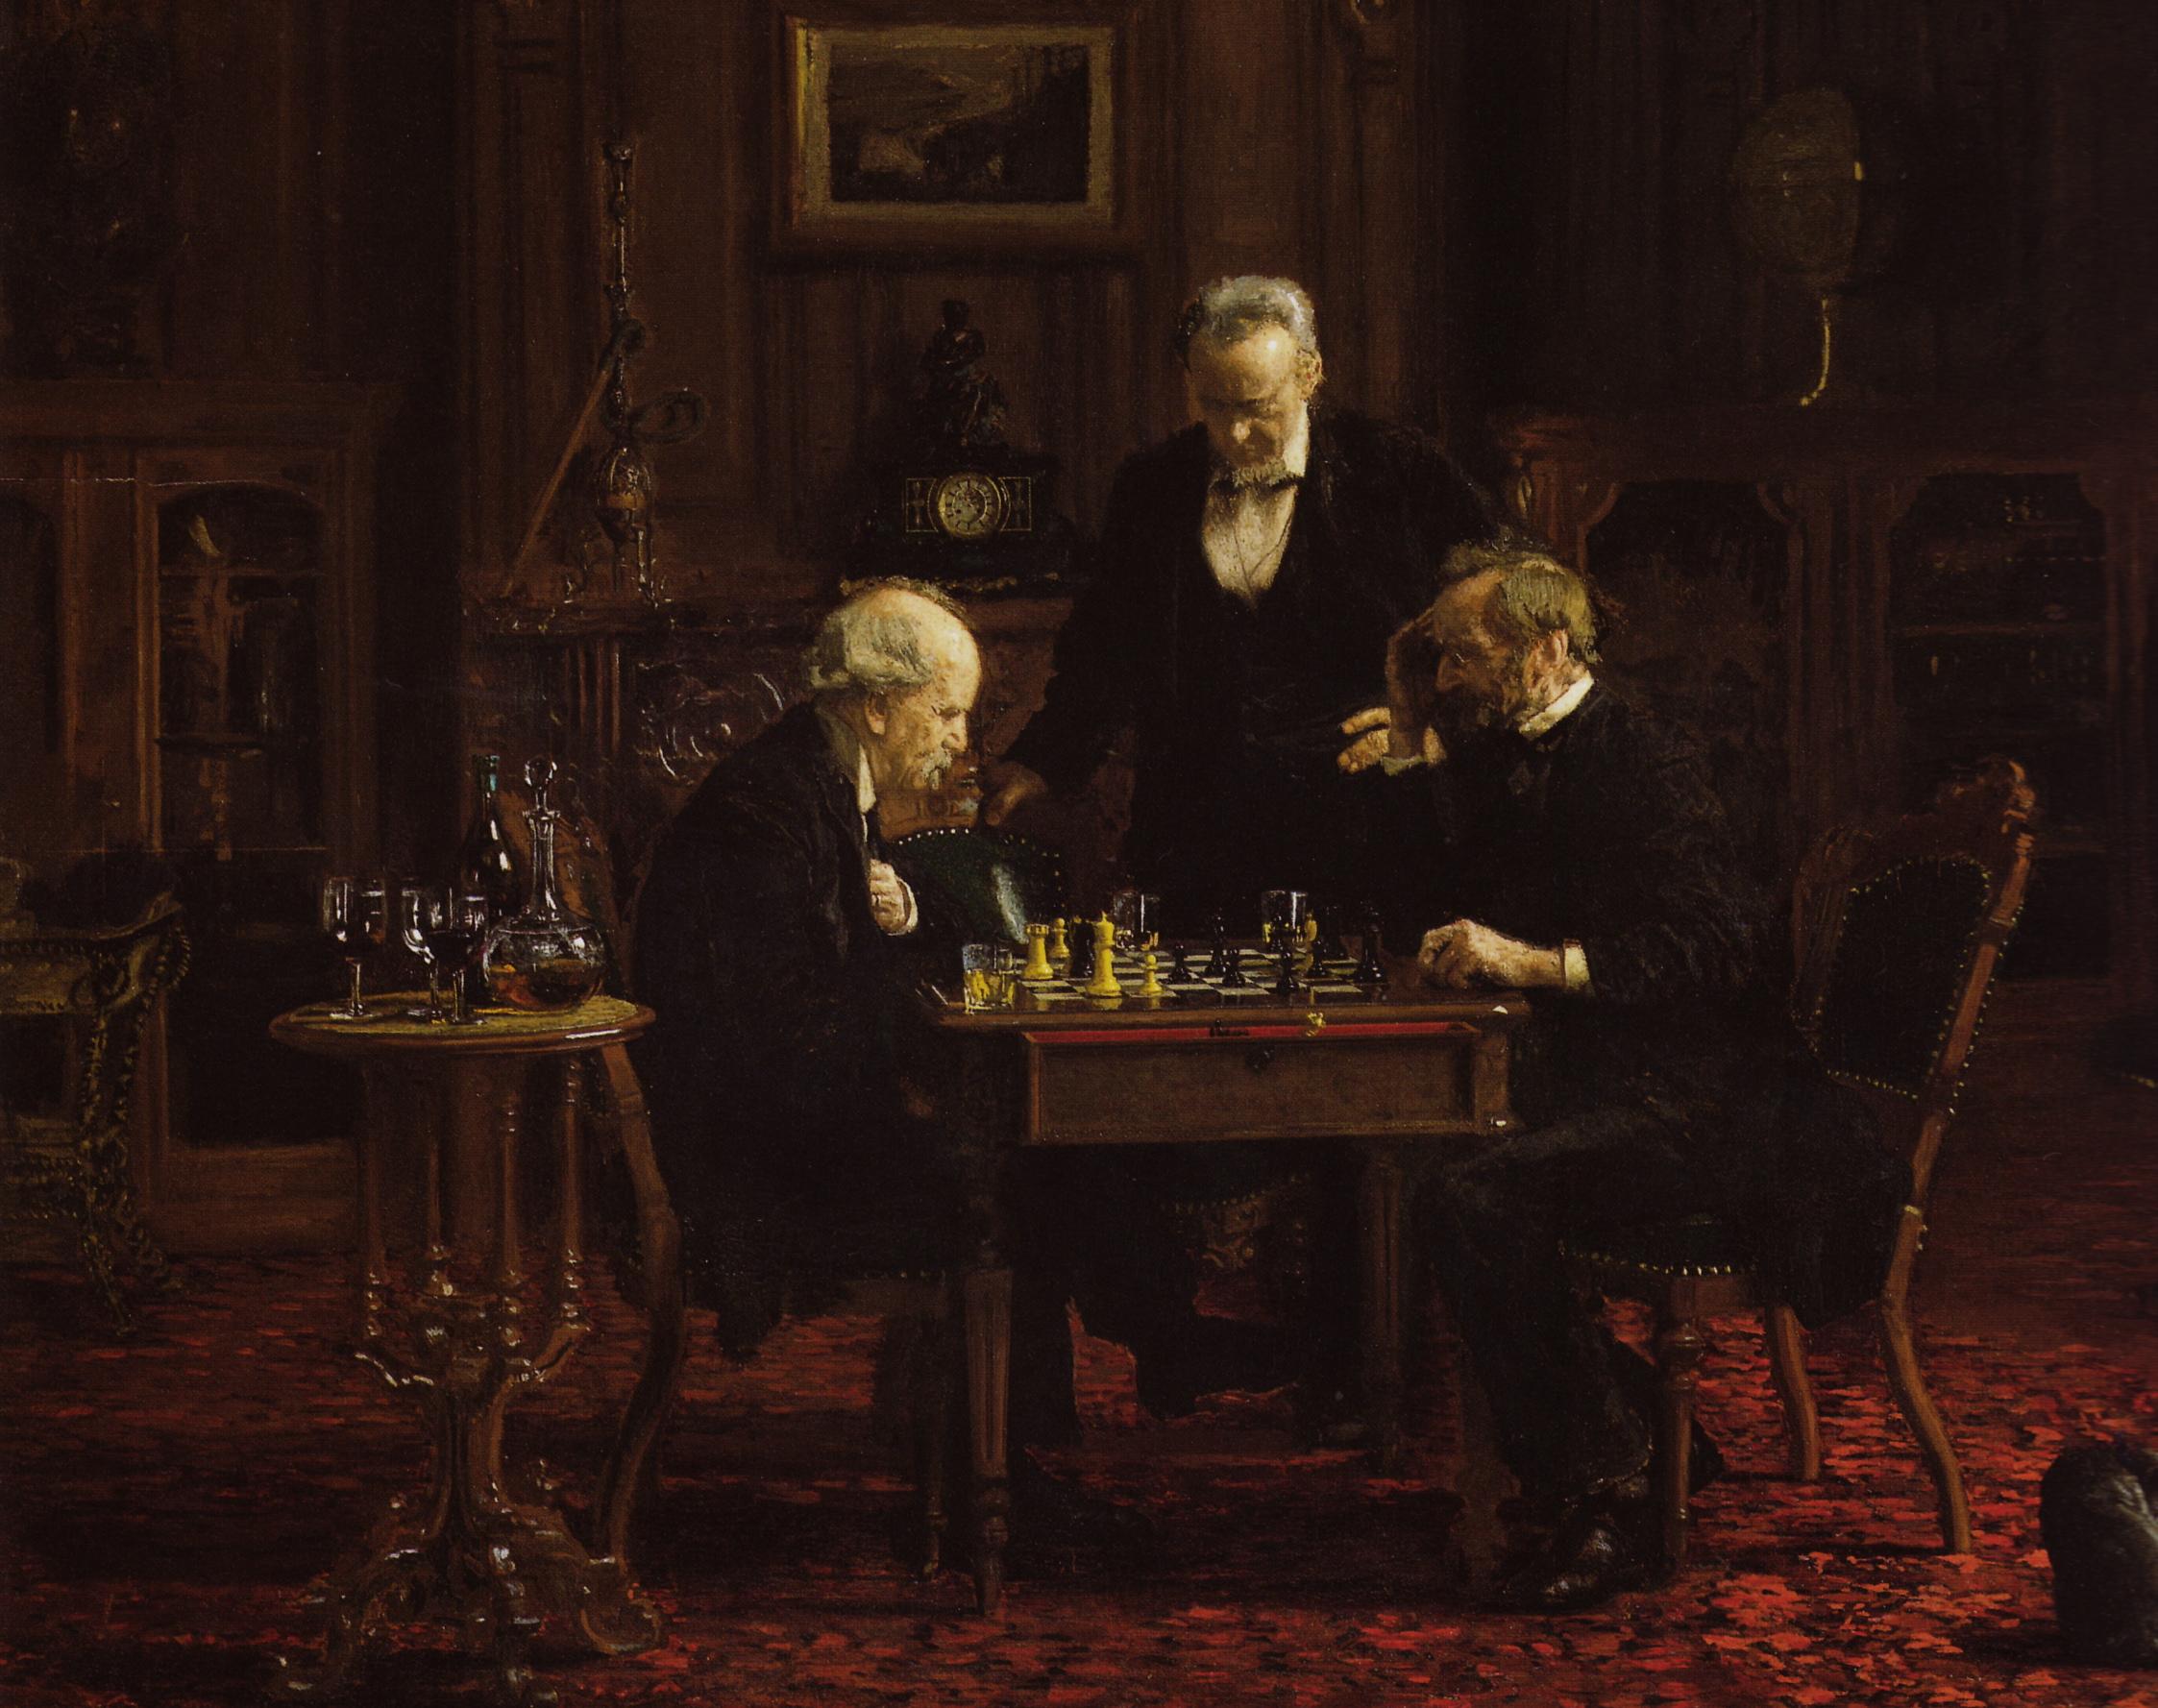 the_chess_players_thomas_eakins